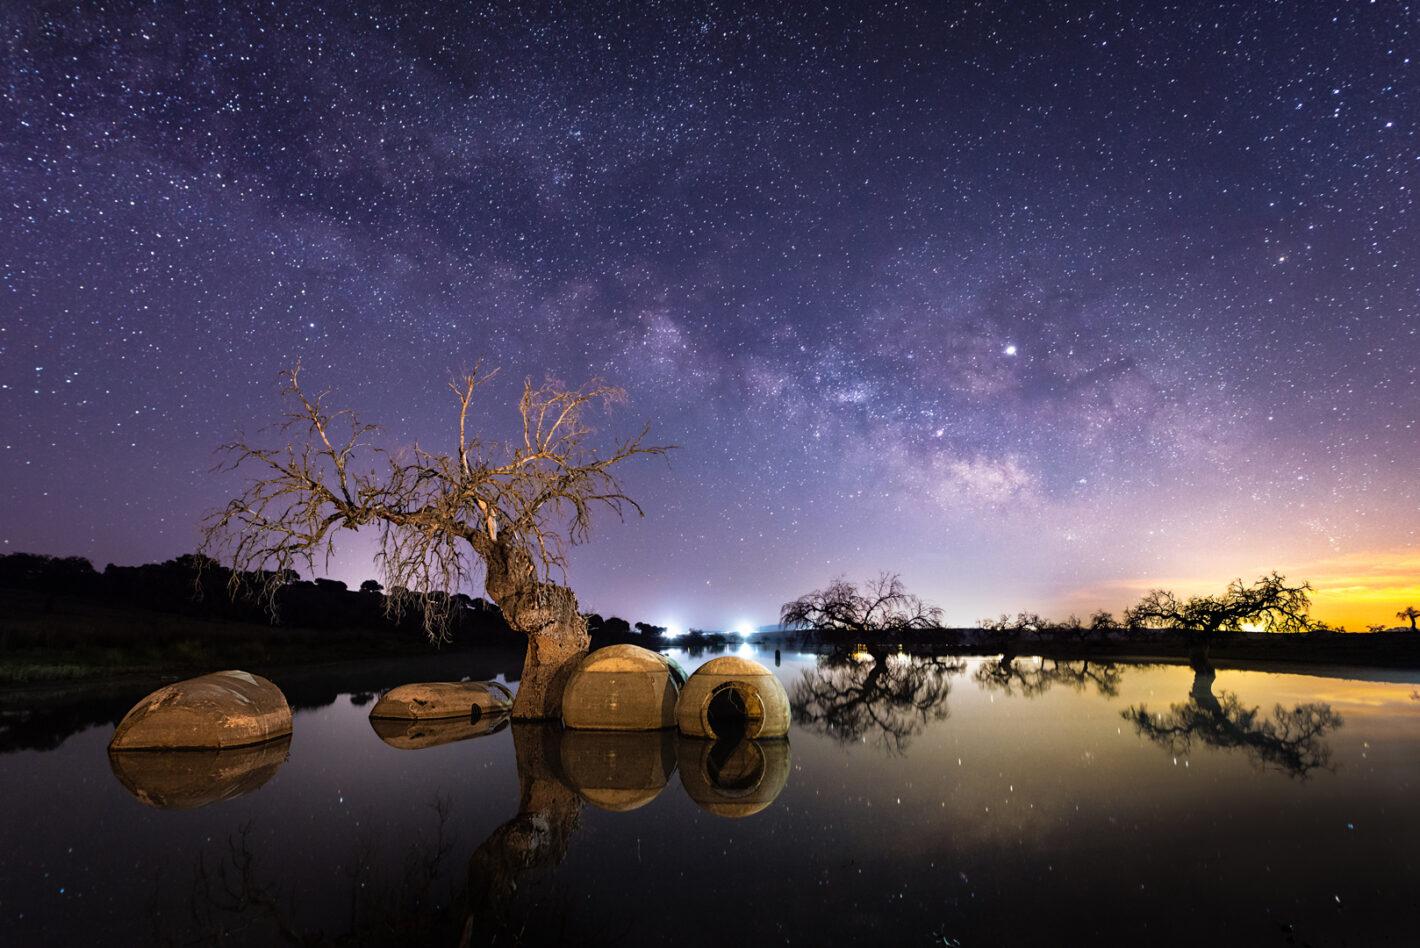 The Heaven, Reserveroir of Vllalba de los Barros, Spain. Nikon D610, 20mm, 20sec, 3 photos, 2500 iso, f2.8